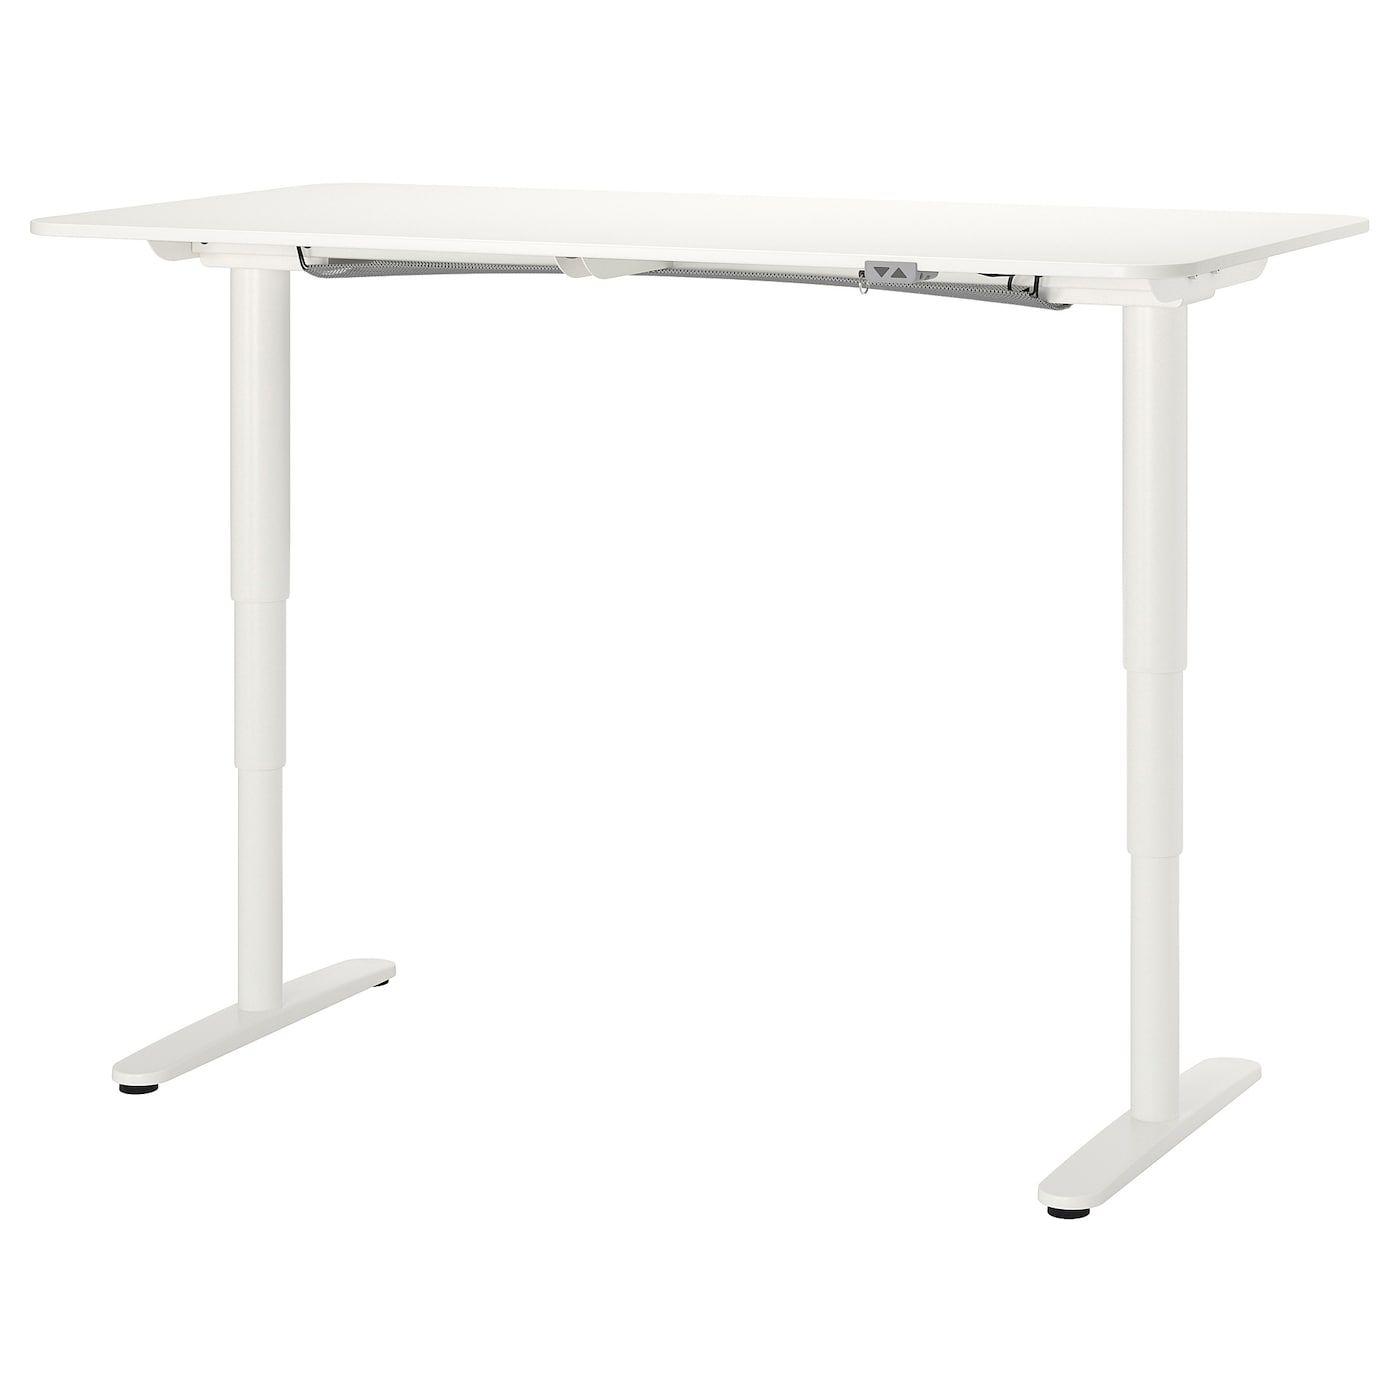 Bekant Skrivbord Sitt Sta Vit 160x80 Cm Ikea In 2020 Ikea Bekant Ikea Design Adjustable Table